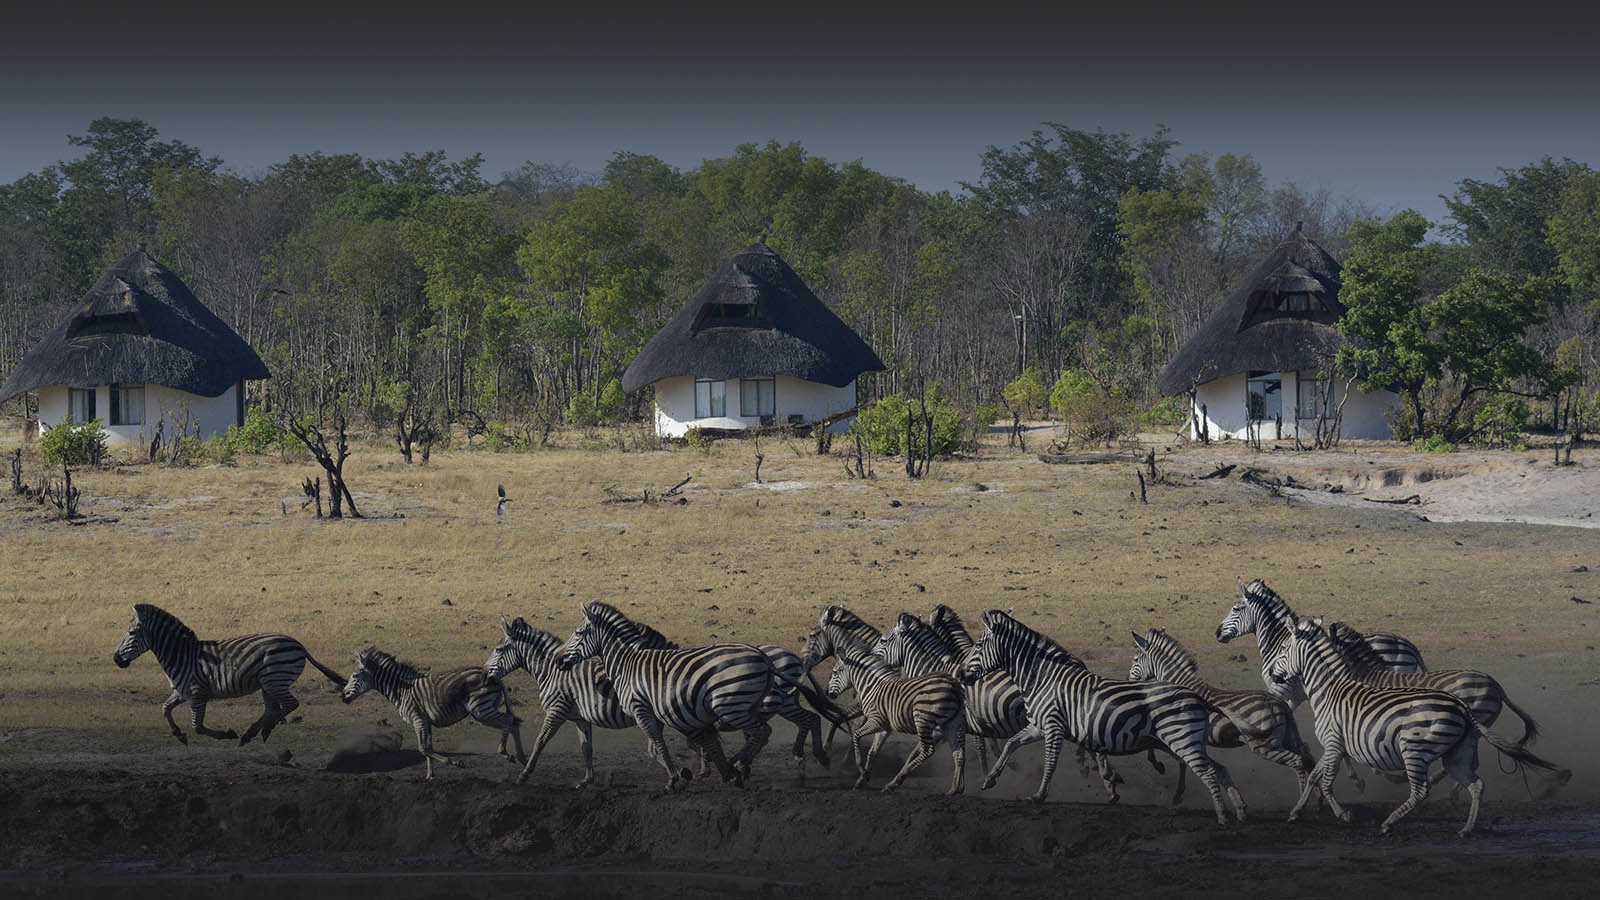 sable sands zimbabwe-lodges-zambia-in-style-safaris-wildlife-africa-hwange-national-park-zebra-dry-season